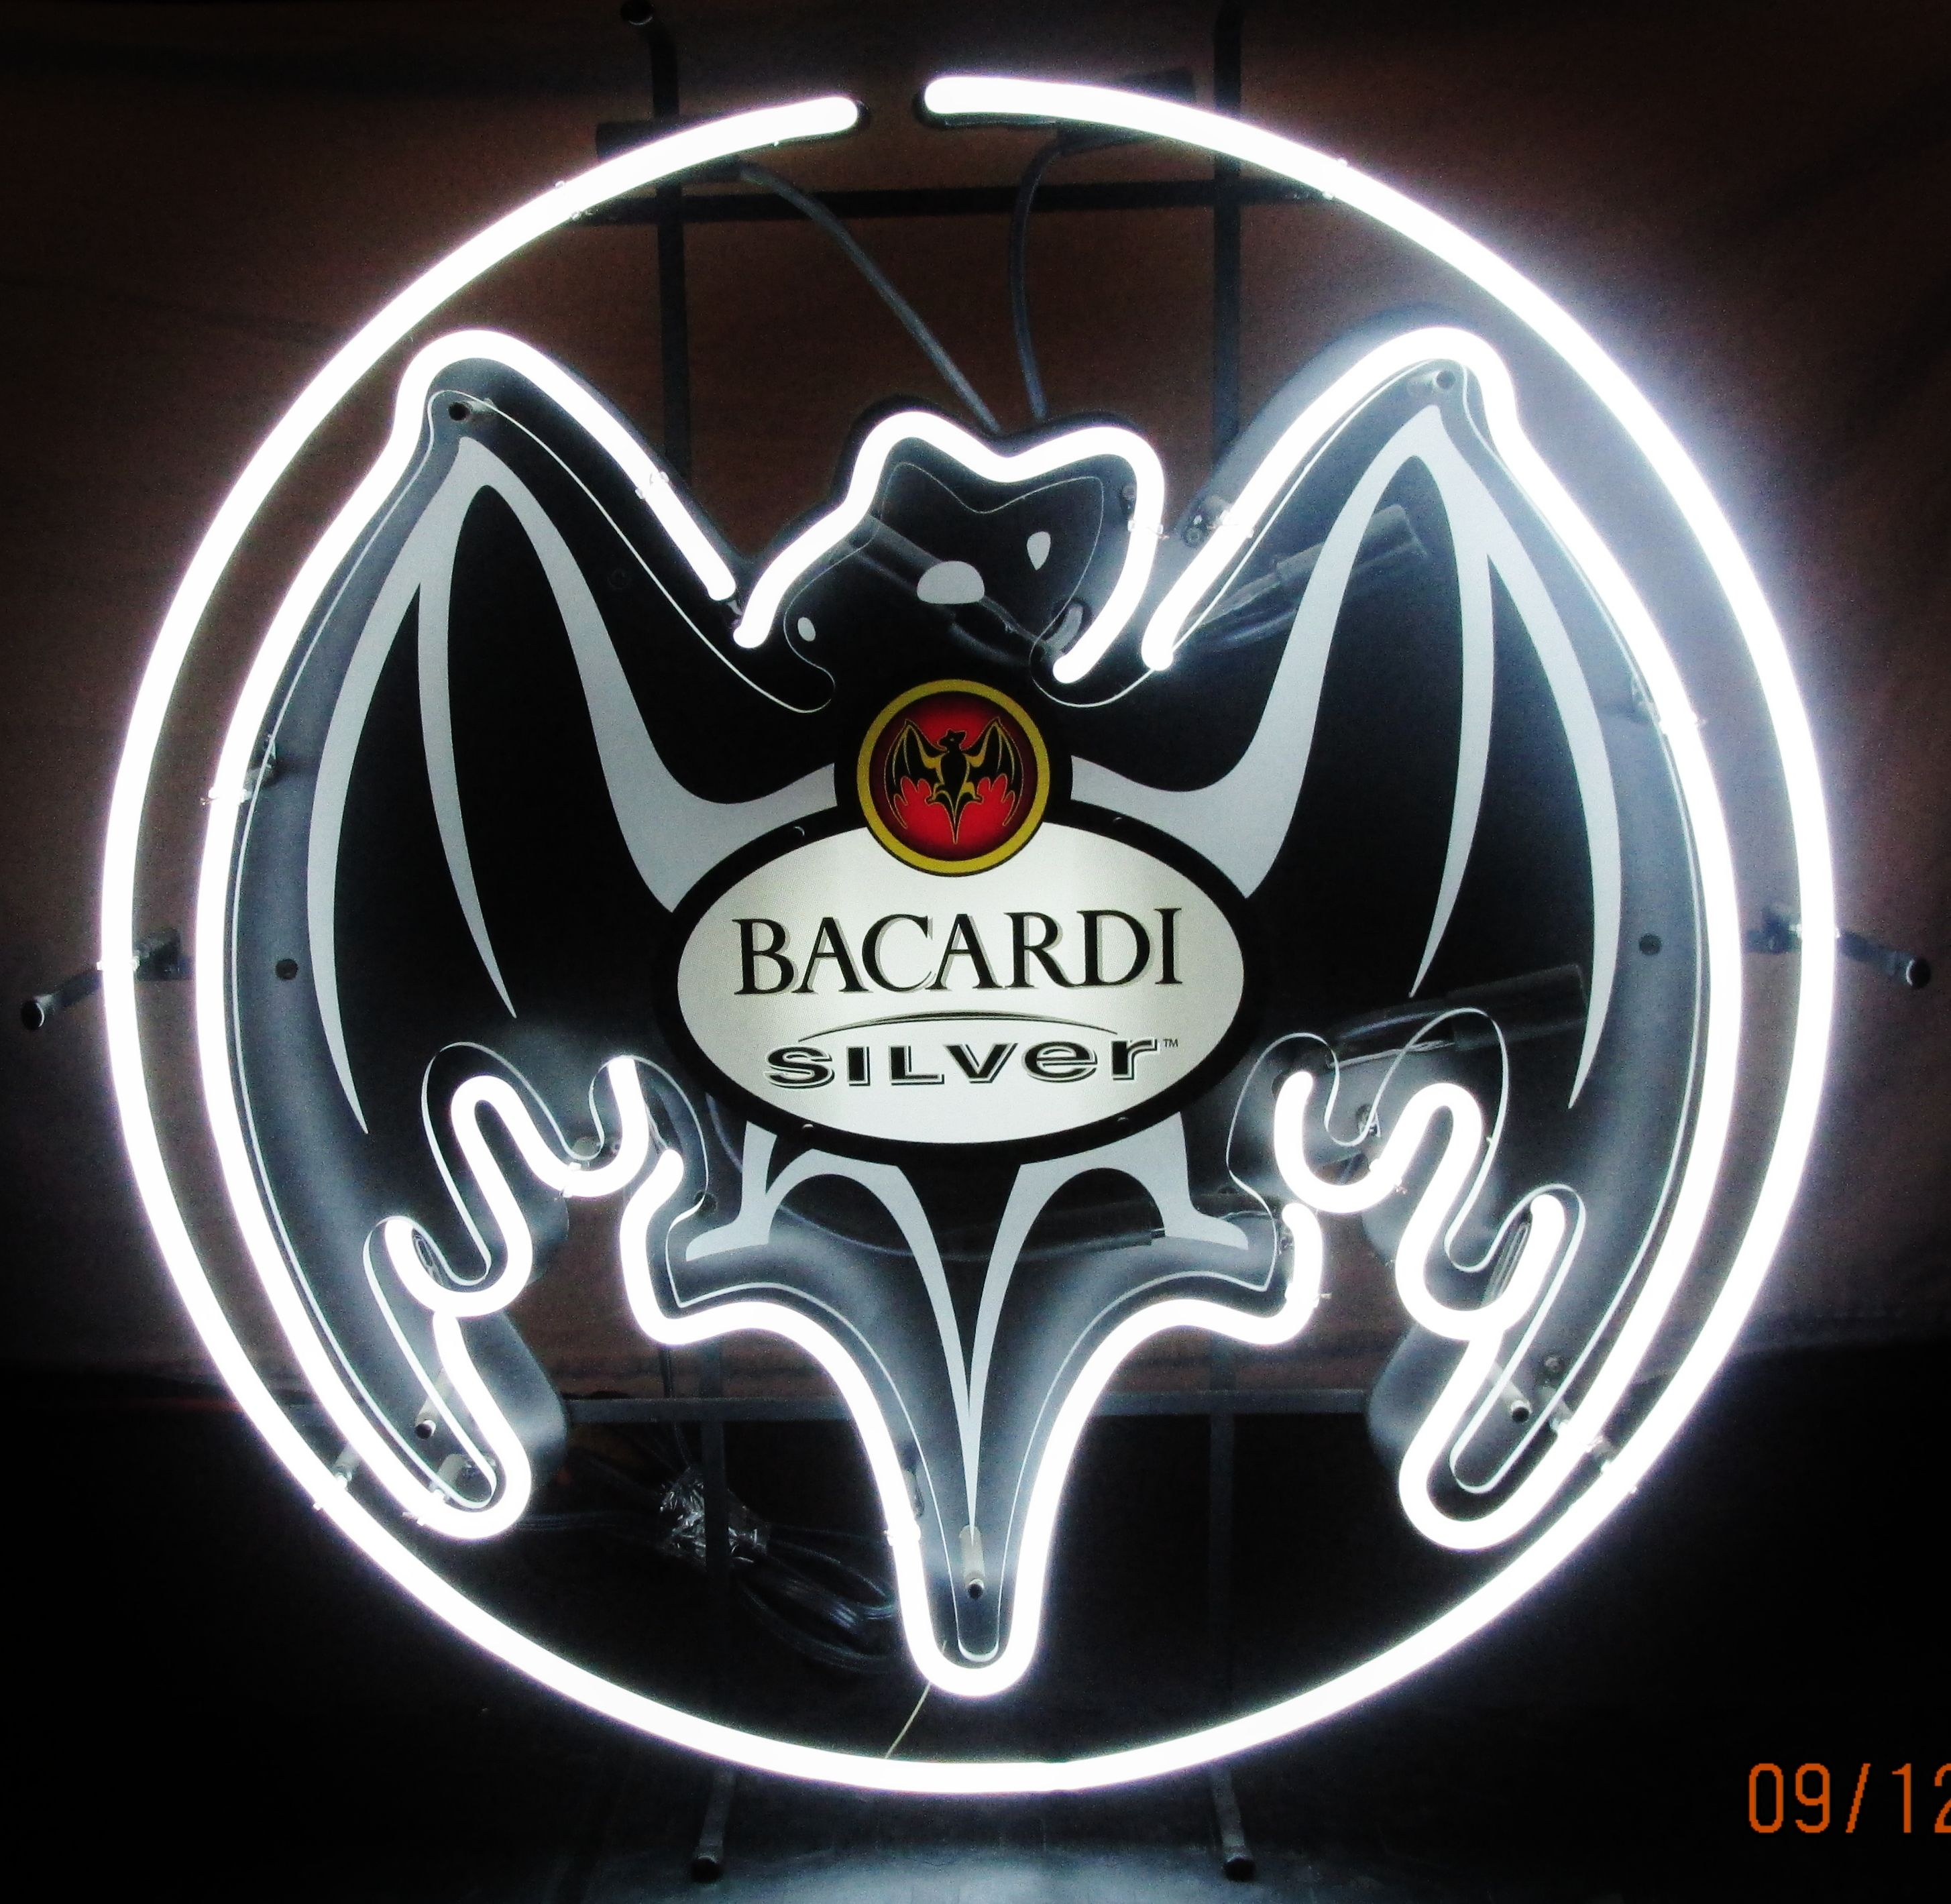 BACARDI SILVER Neon Bar Sign, circa 1997